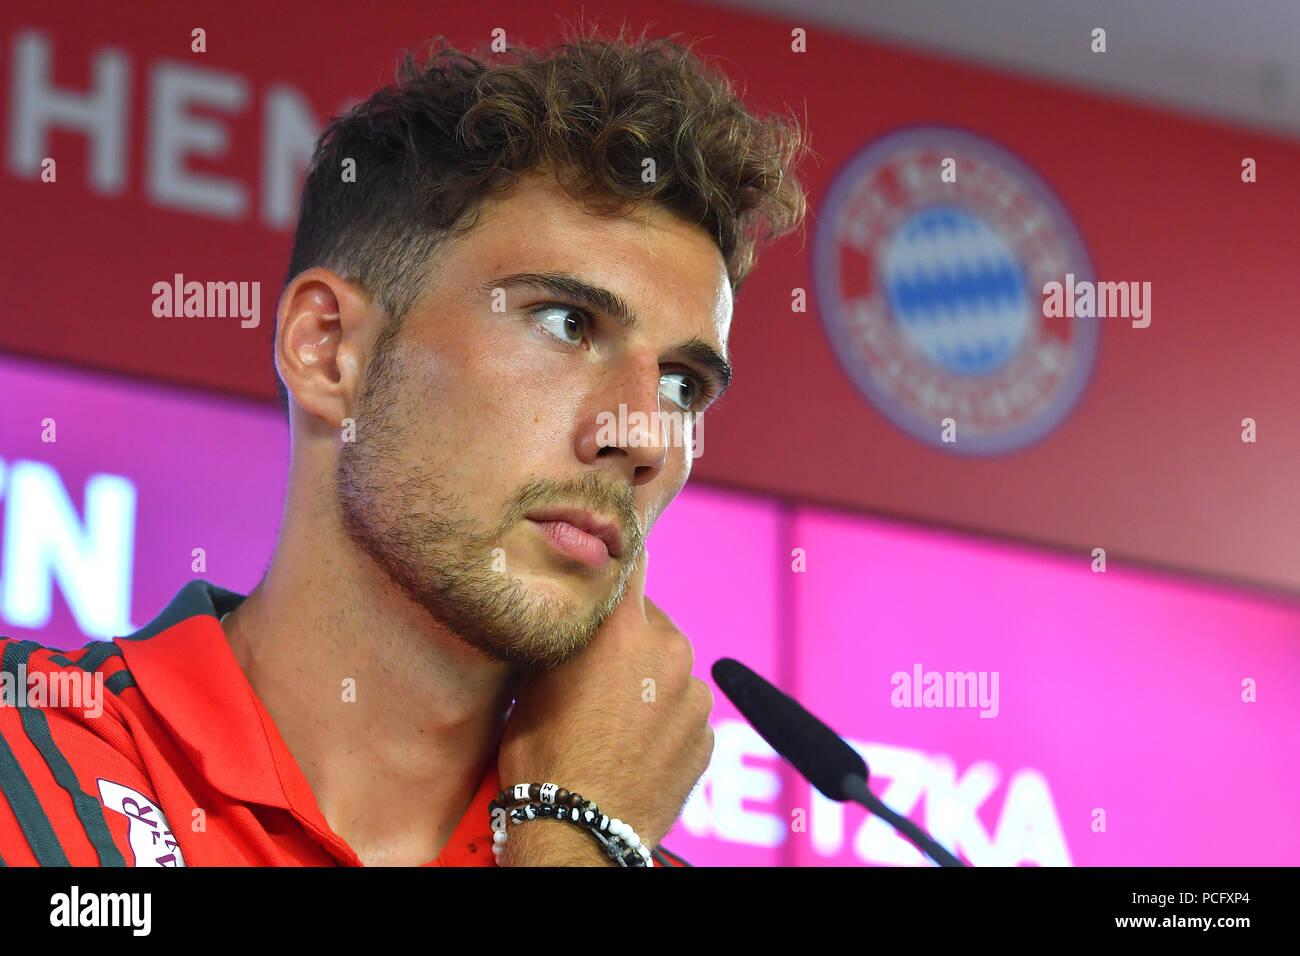 Maillot Domicile FC Bayern München Leon Goretzka